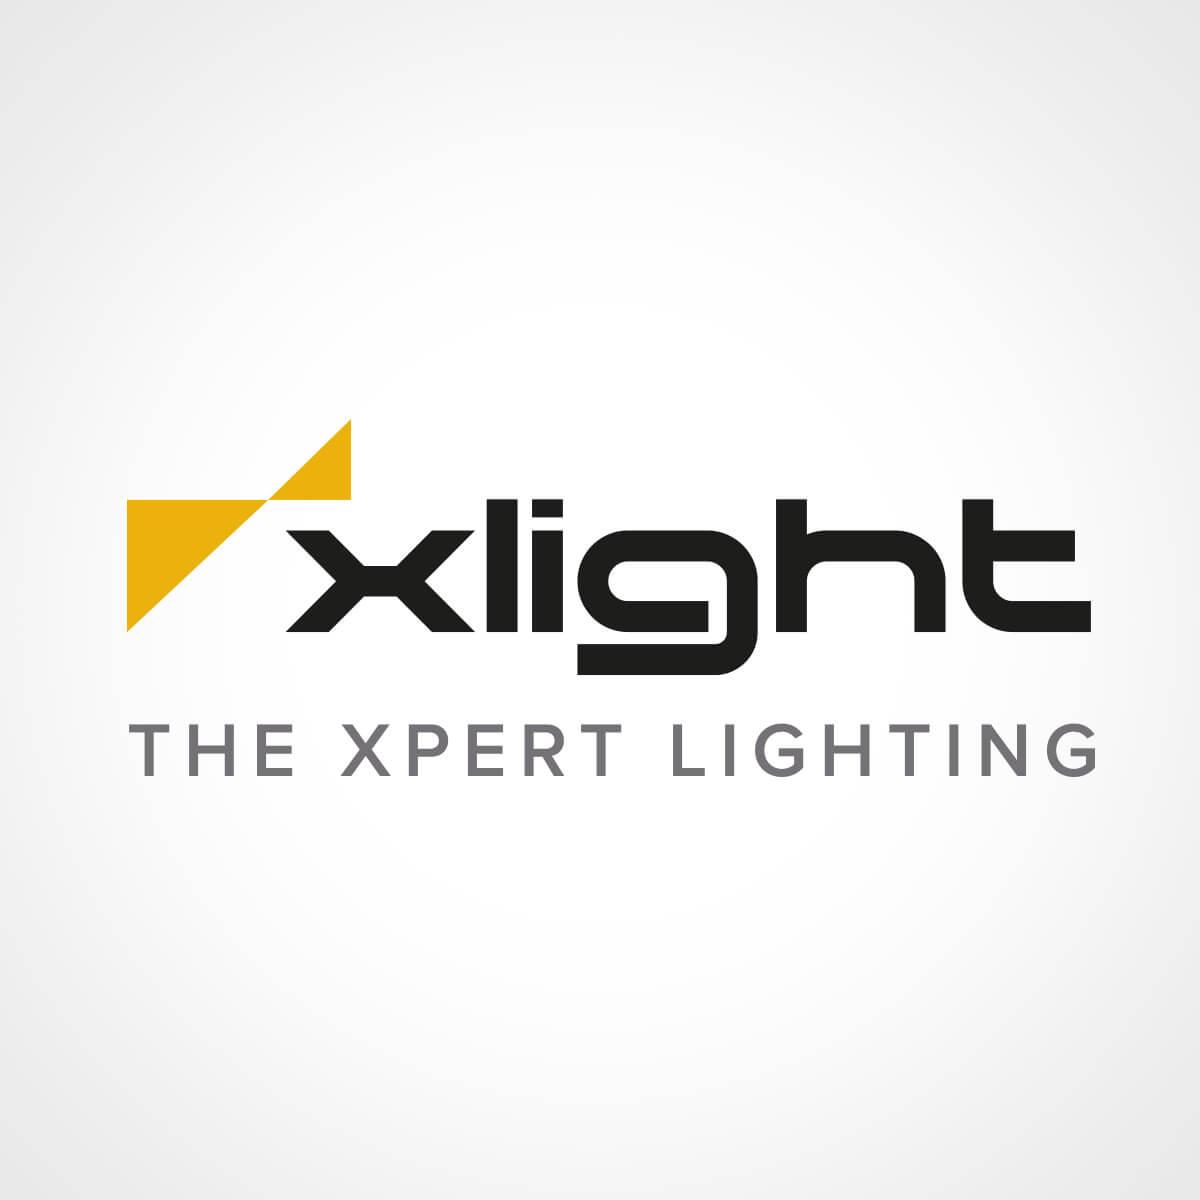 XLight logo design